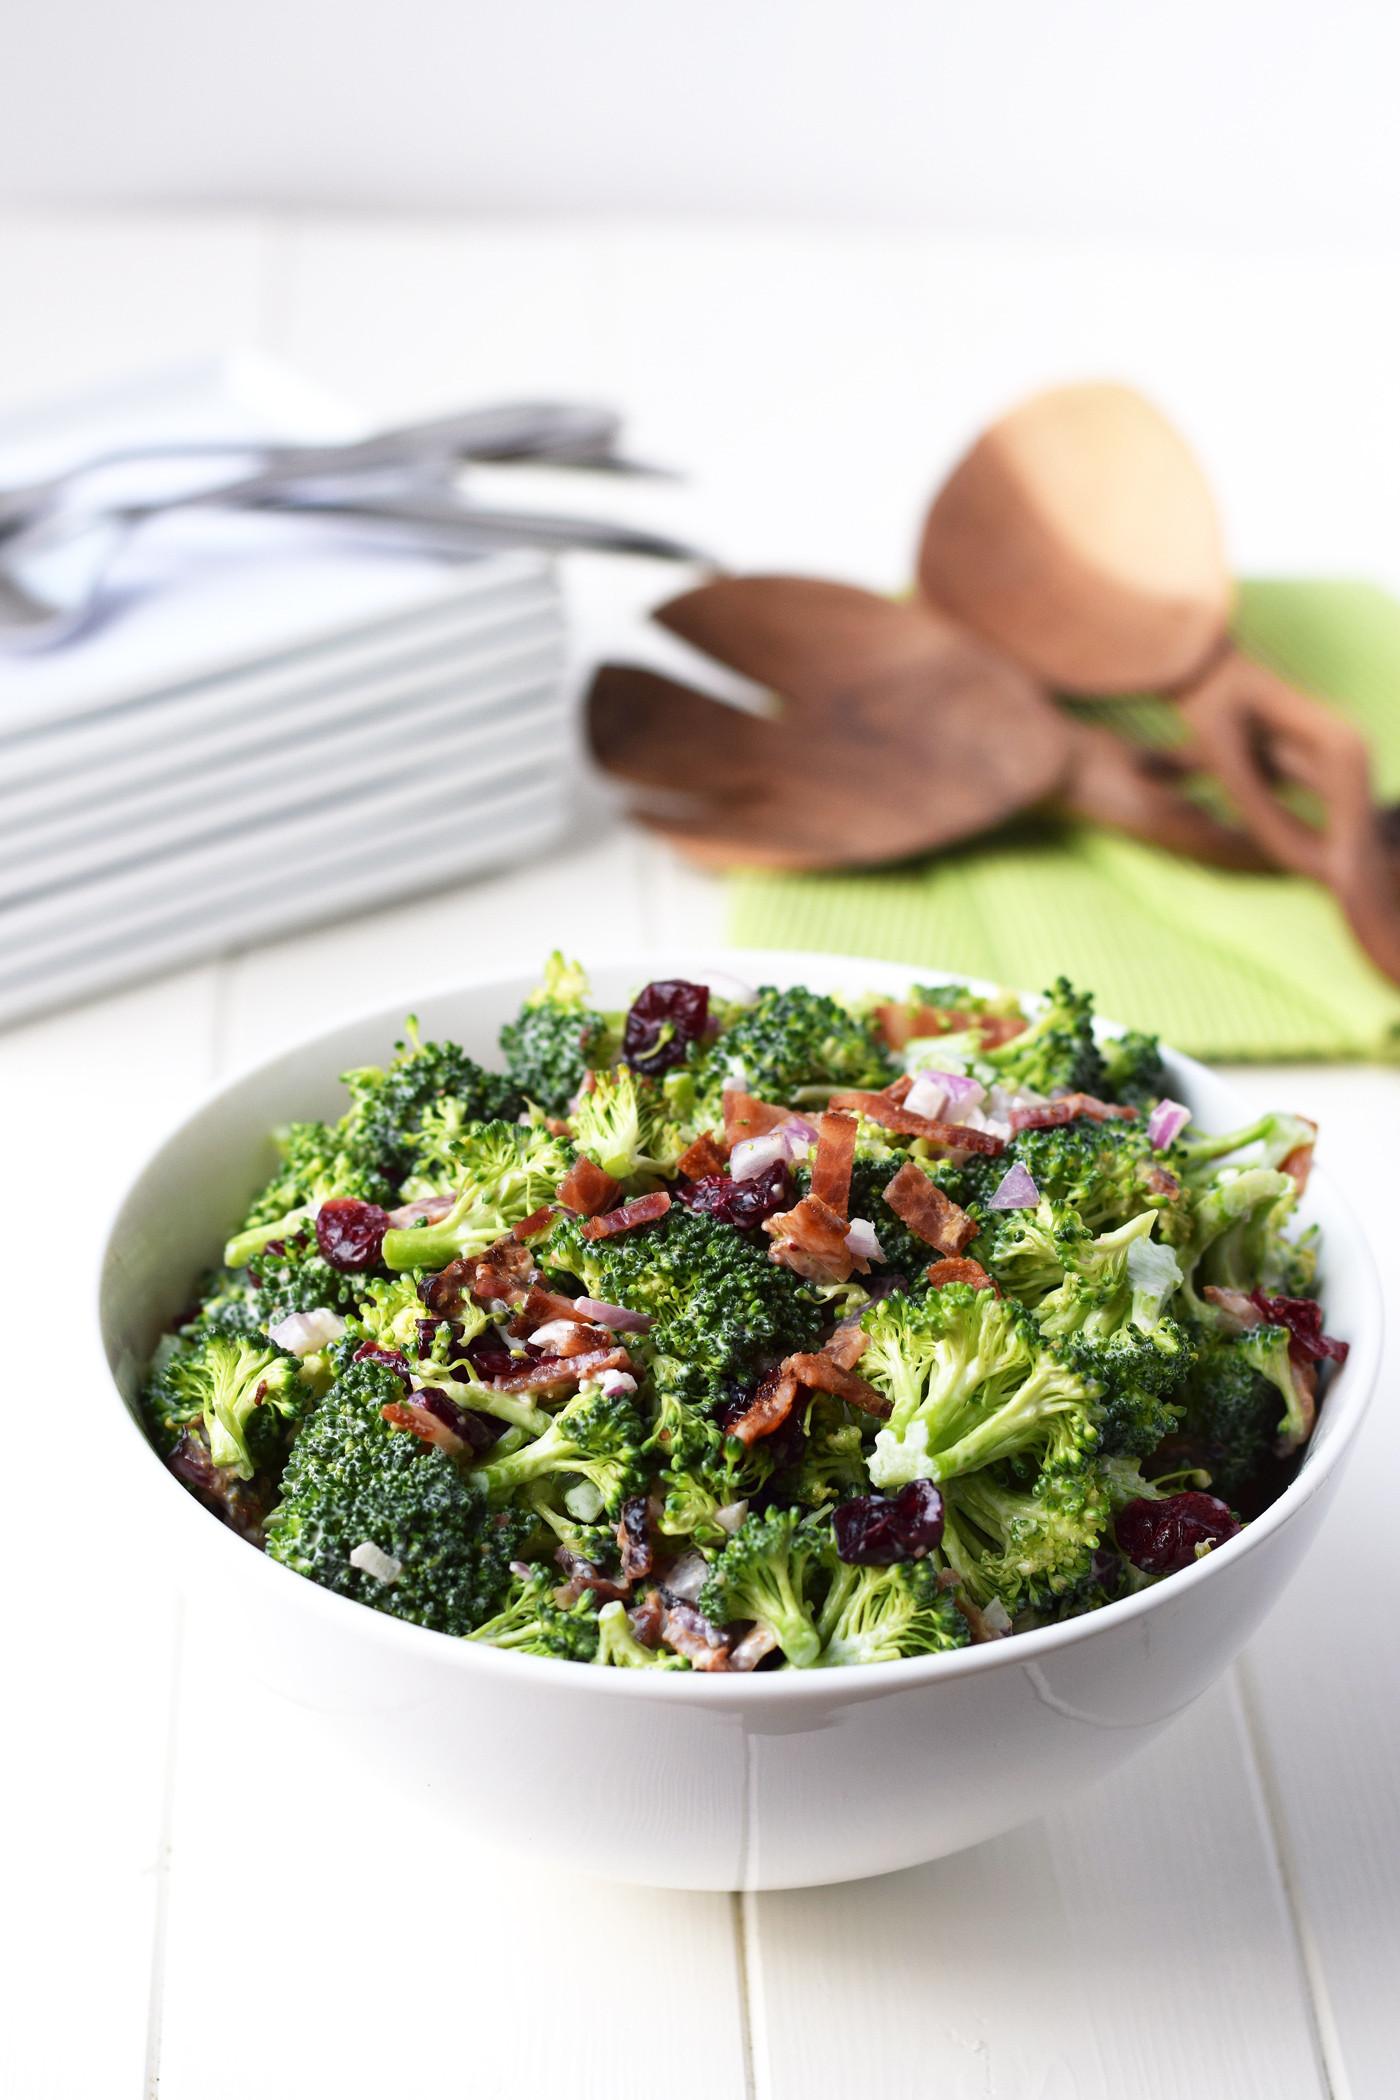 Healthy Broccoli Recipes  healthy broccoli salad recipe with greek yogurt